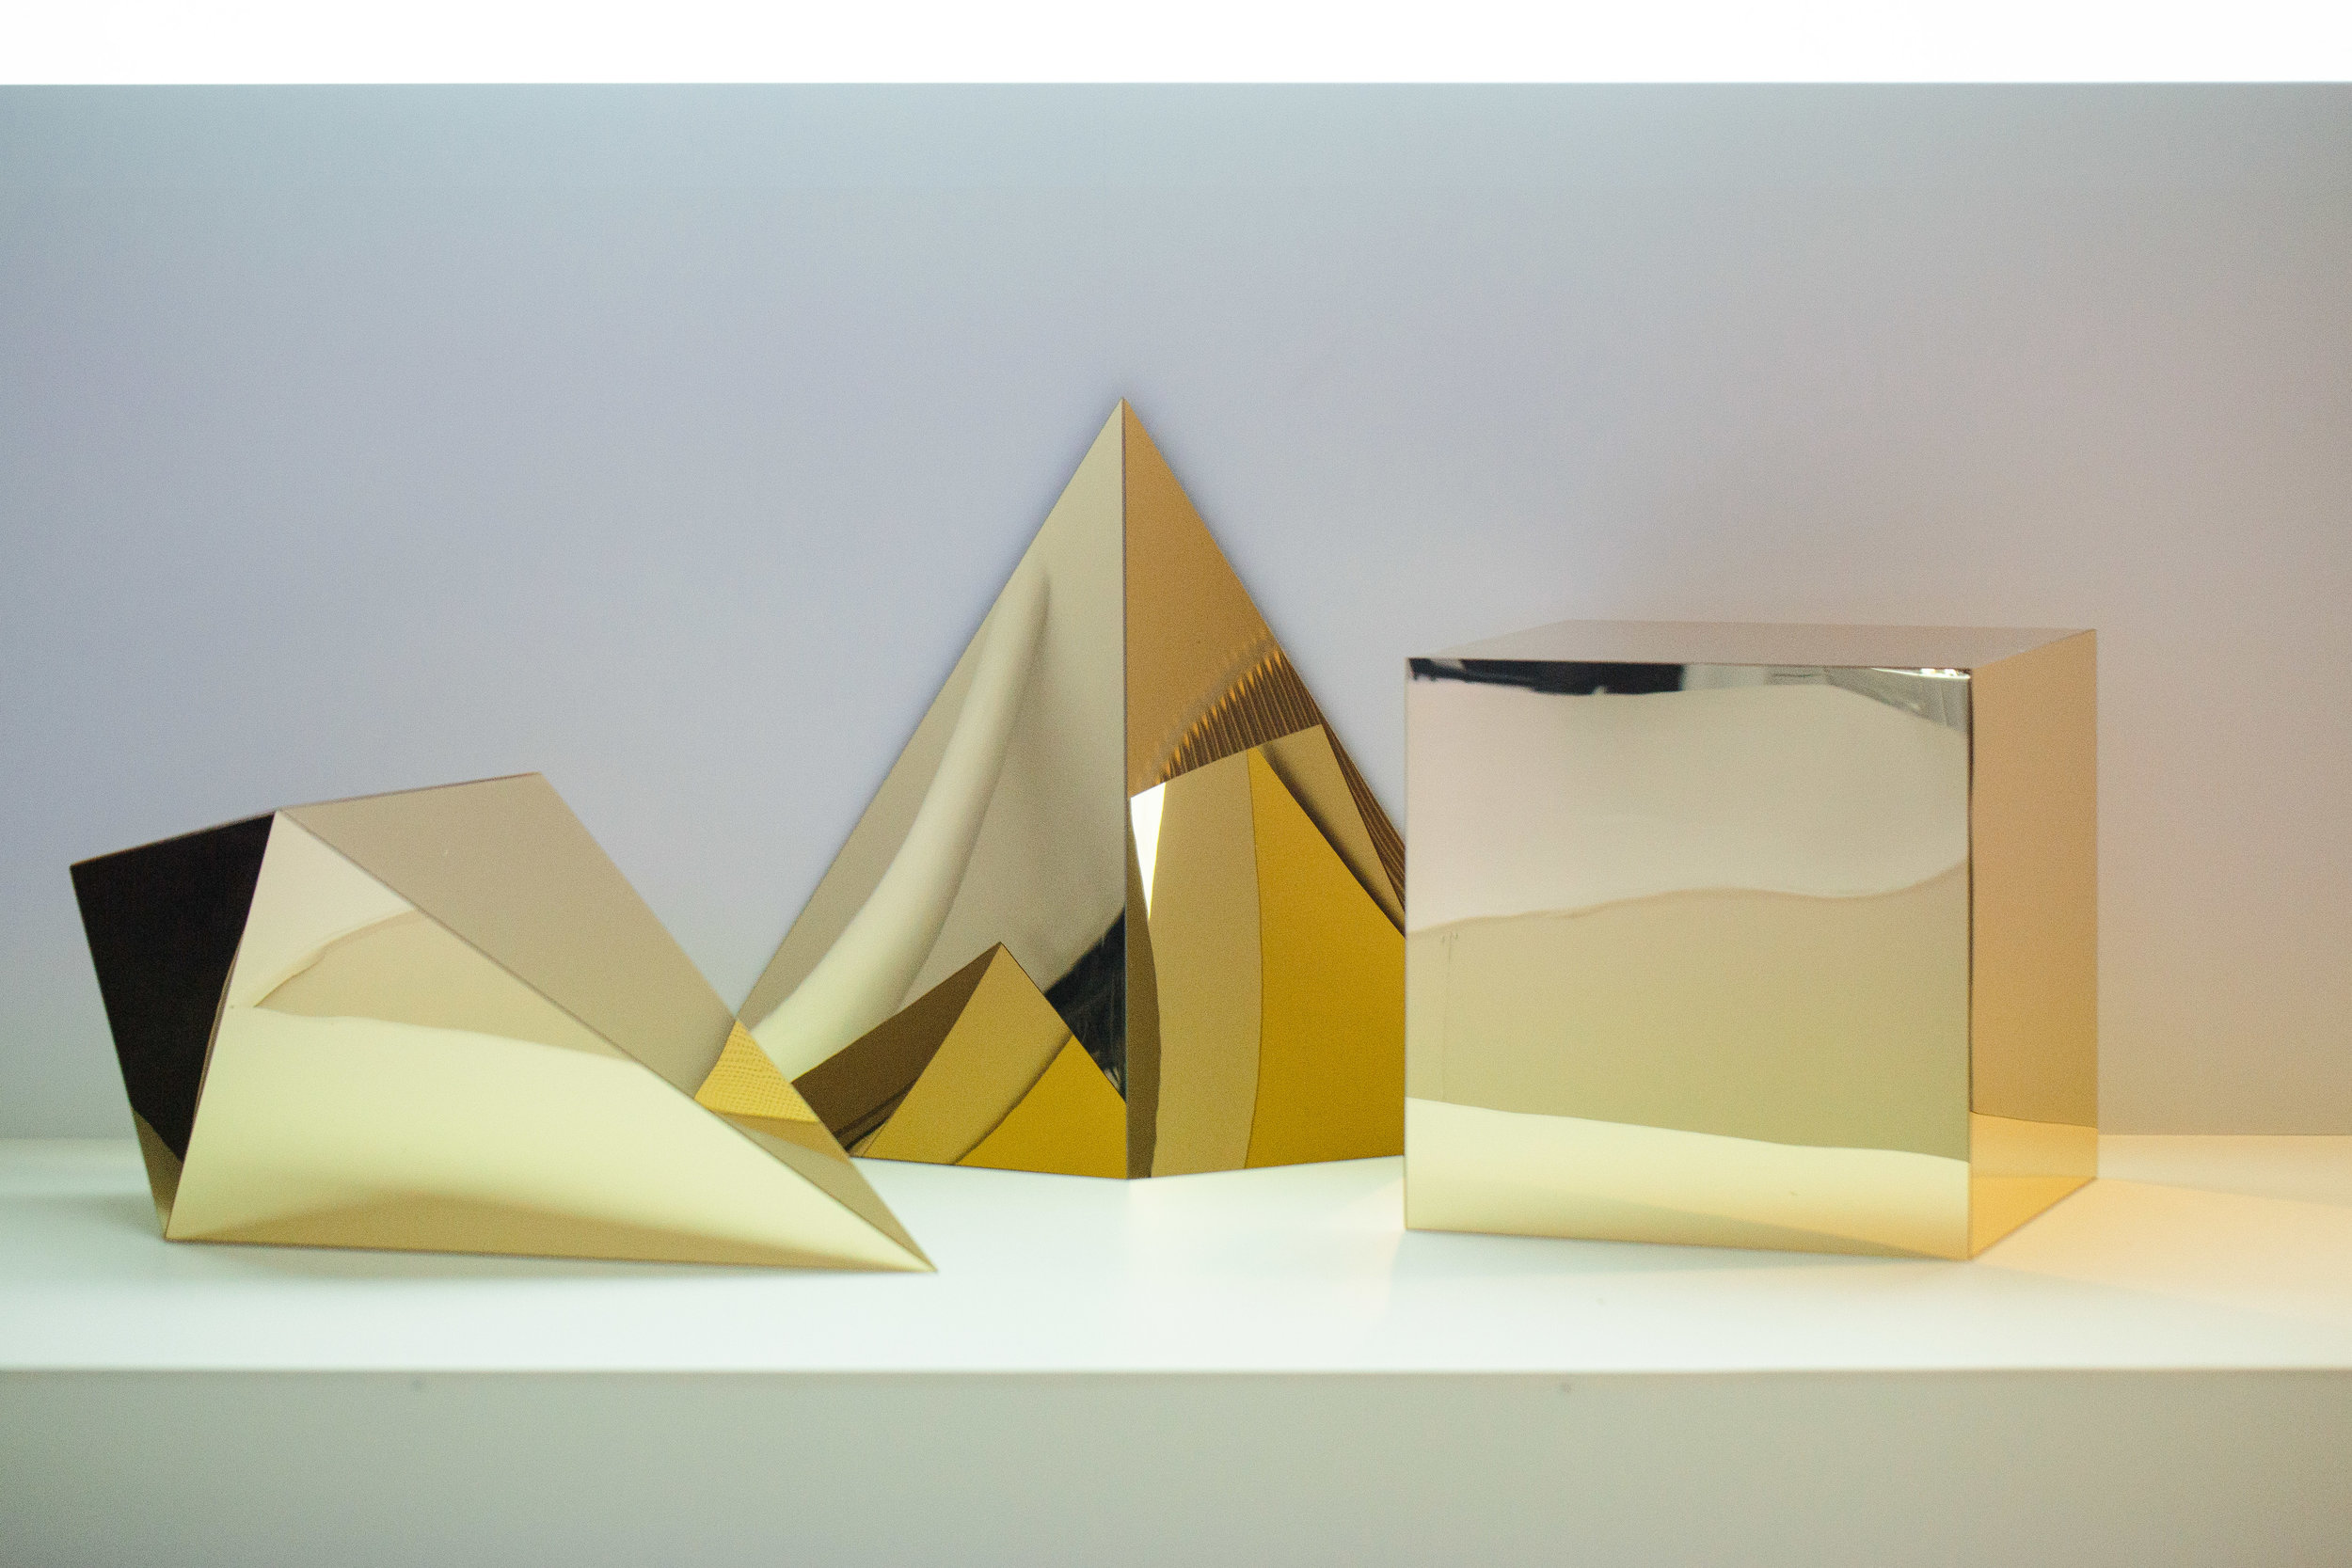 002 Sunglass Hut - 10040010.jpg